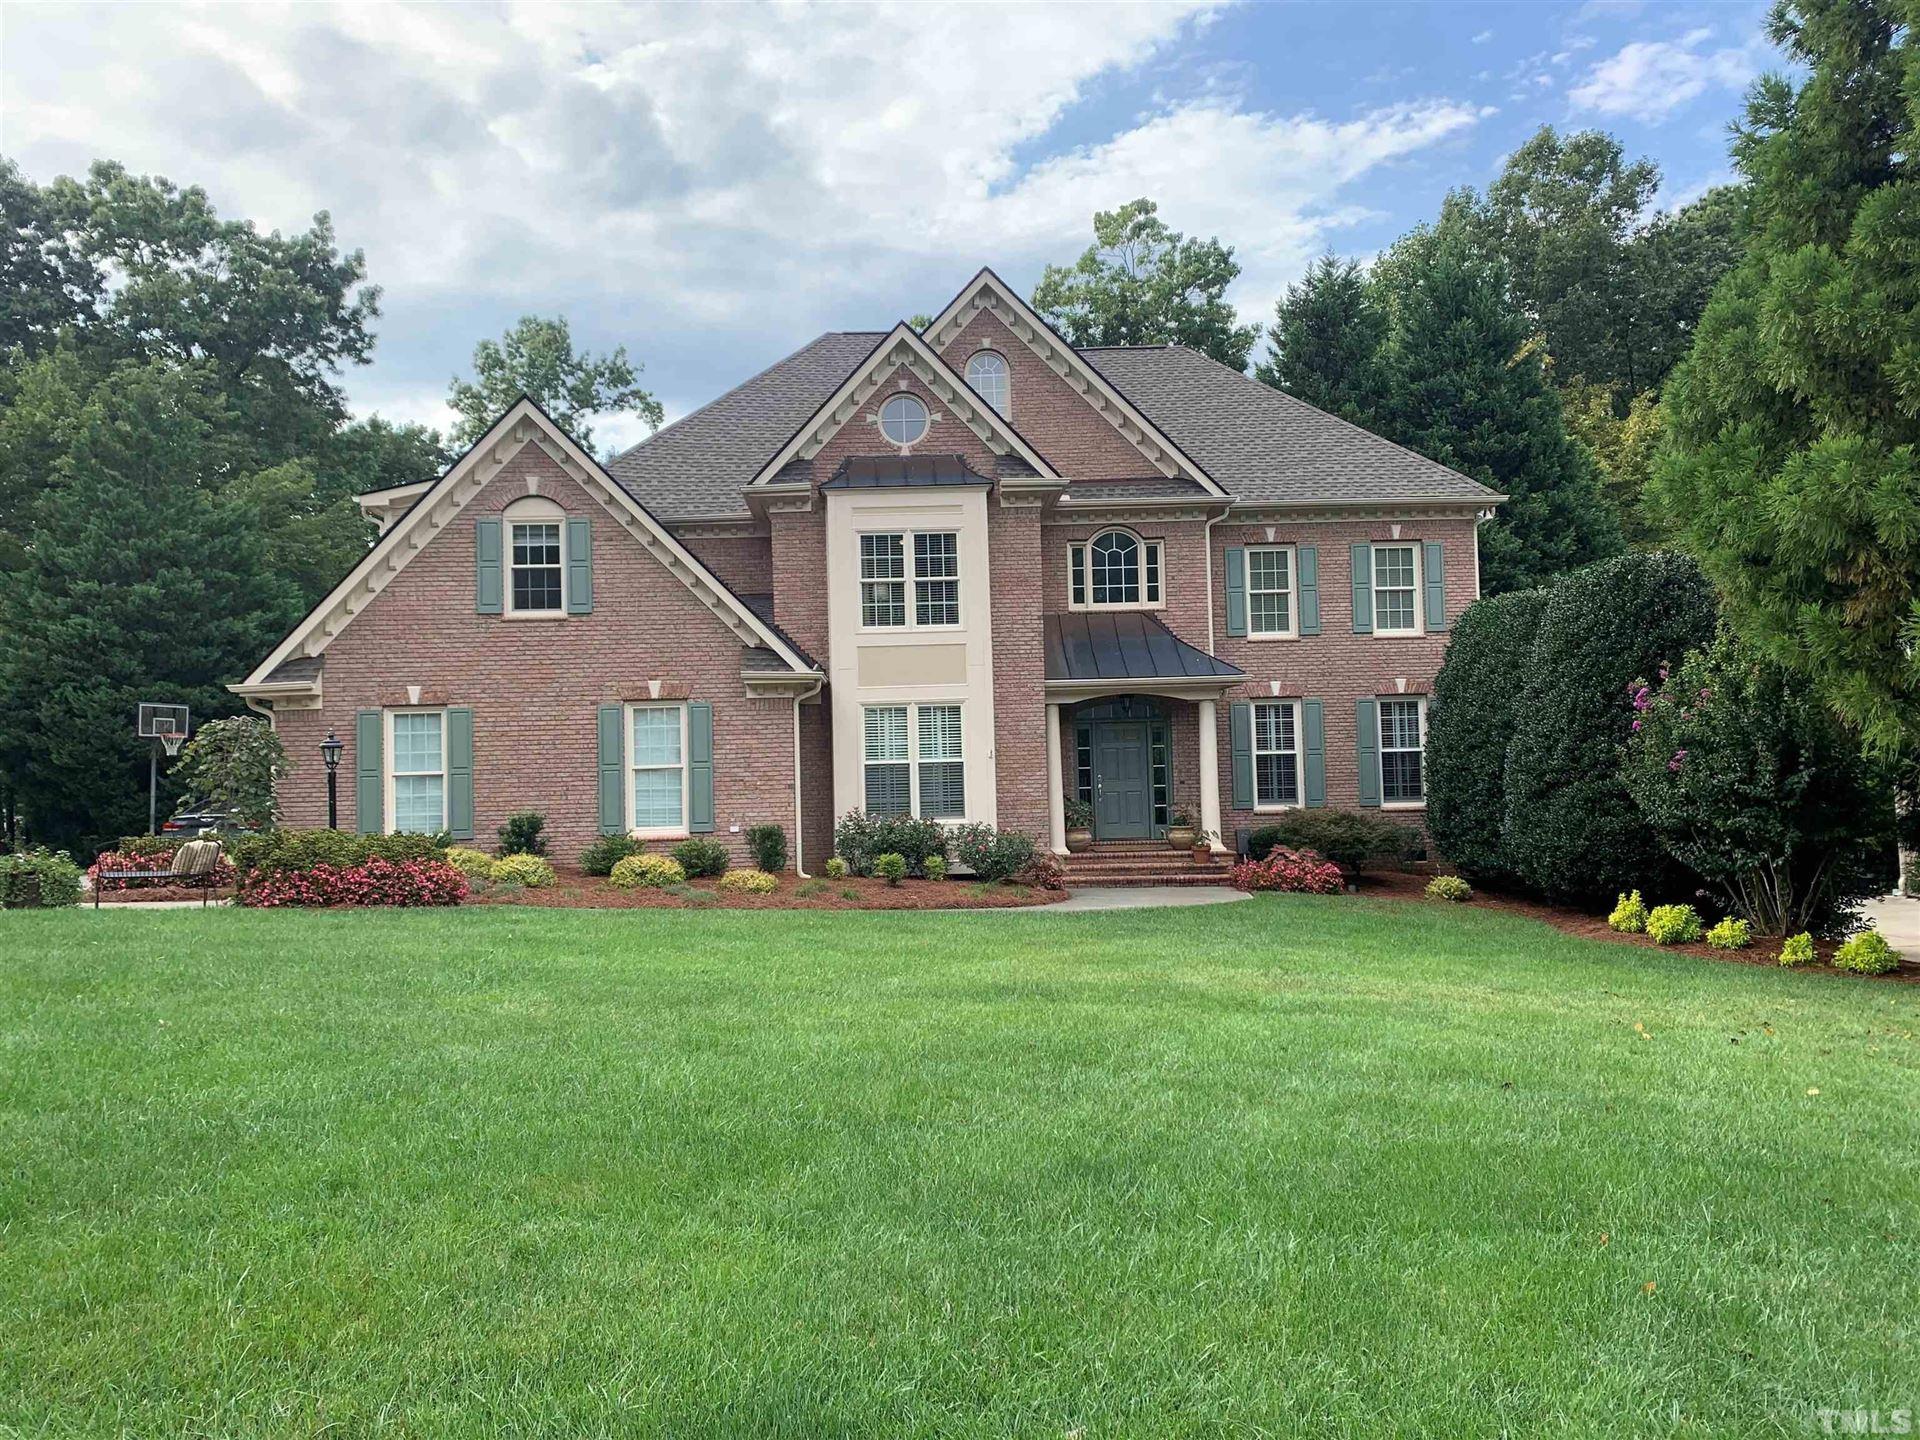 Photo of 9017 Leverton Lane, Raleigh, NC 27615 (MLS # 2409514)